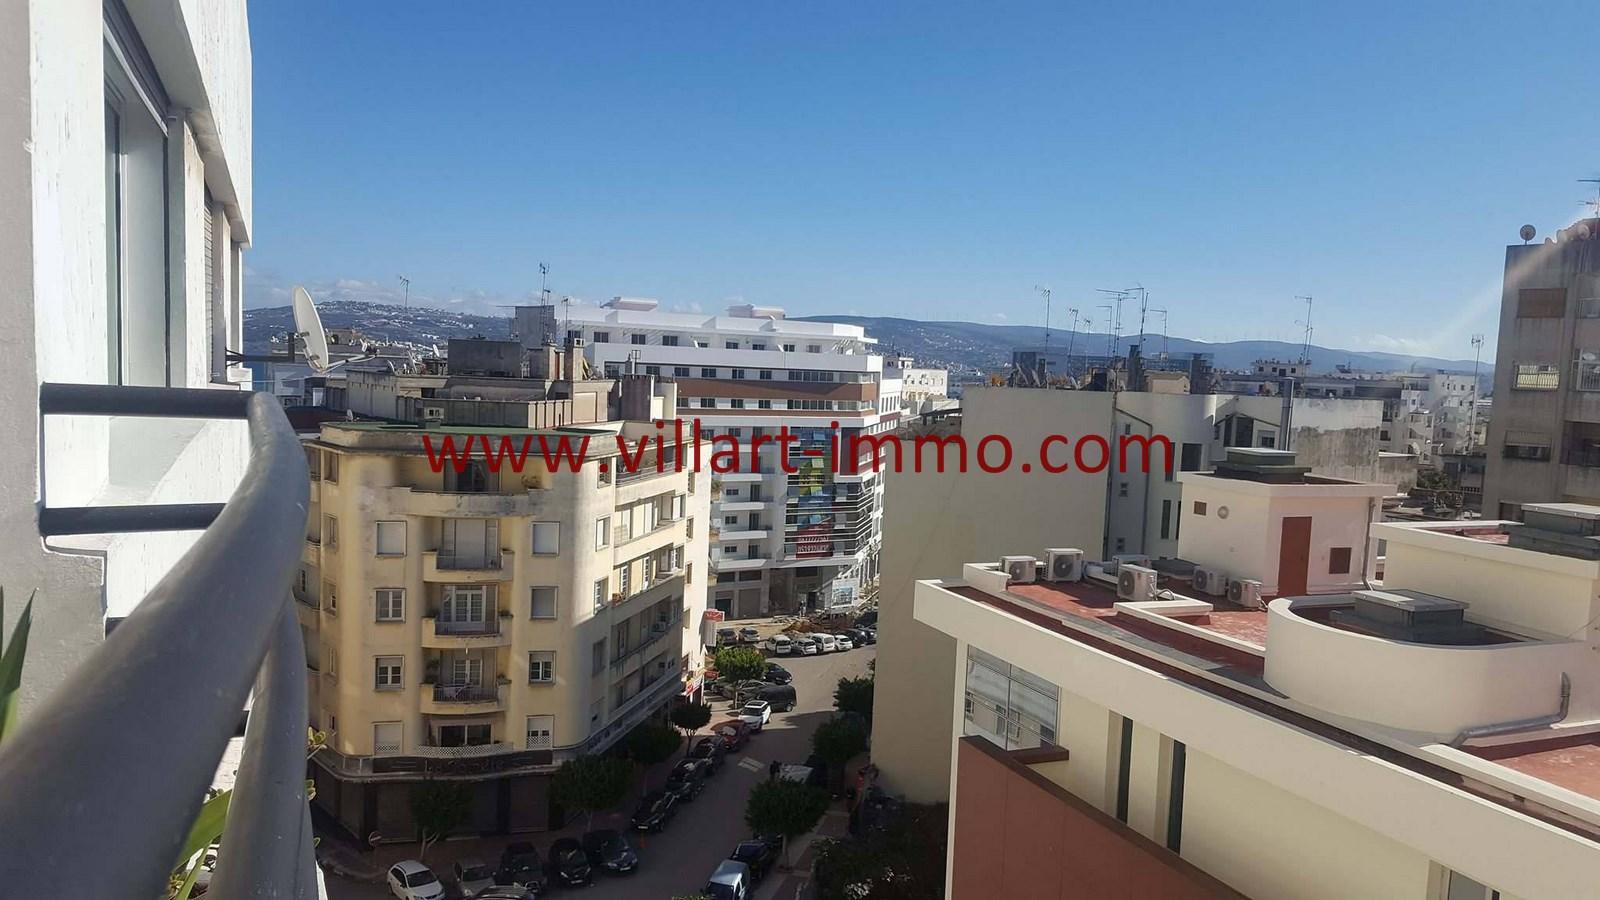 7-Vente-Appartement-Centre-ville-Tanger-Vue 2-VA531-Villart Immo